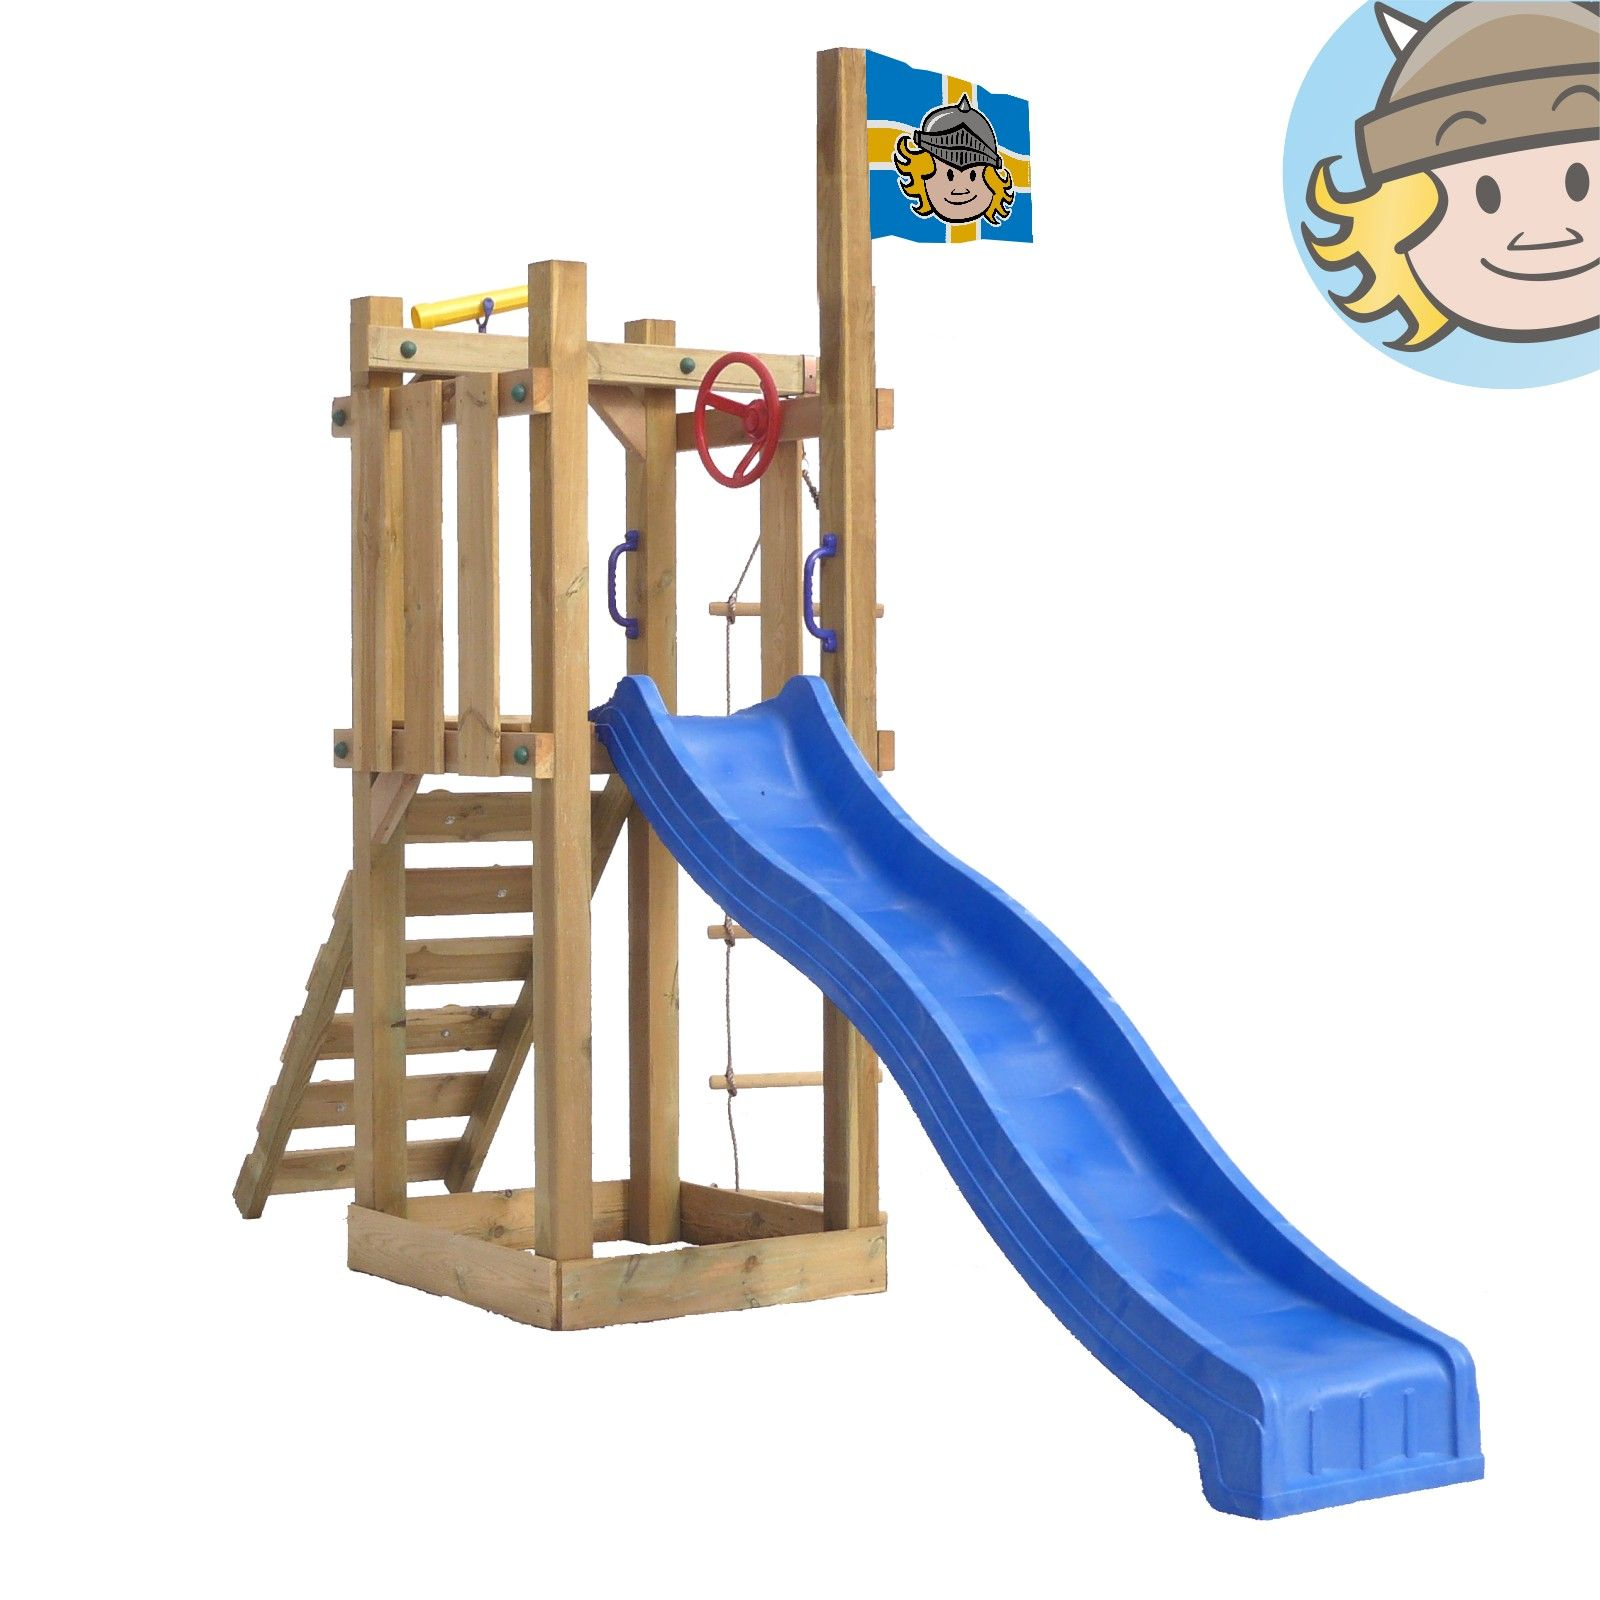 details about wickey castle minodor climbing frame slide. Black Bedroom Furniture Sets. Home Design Ideas